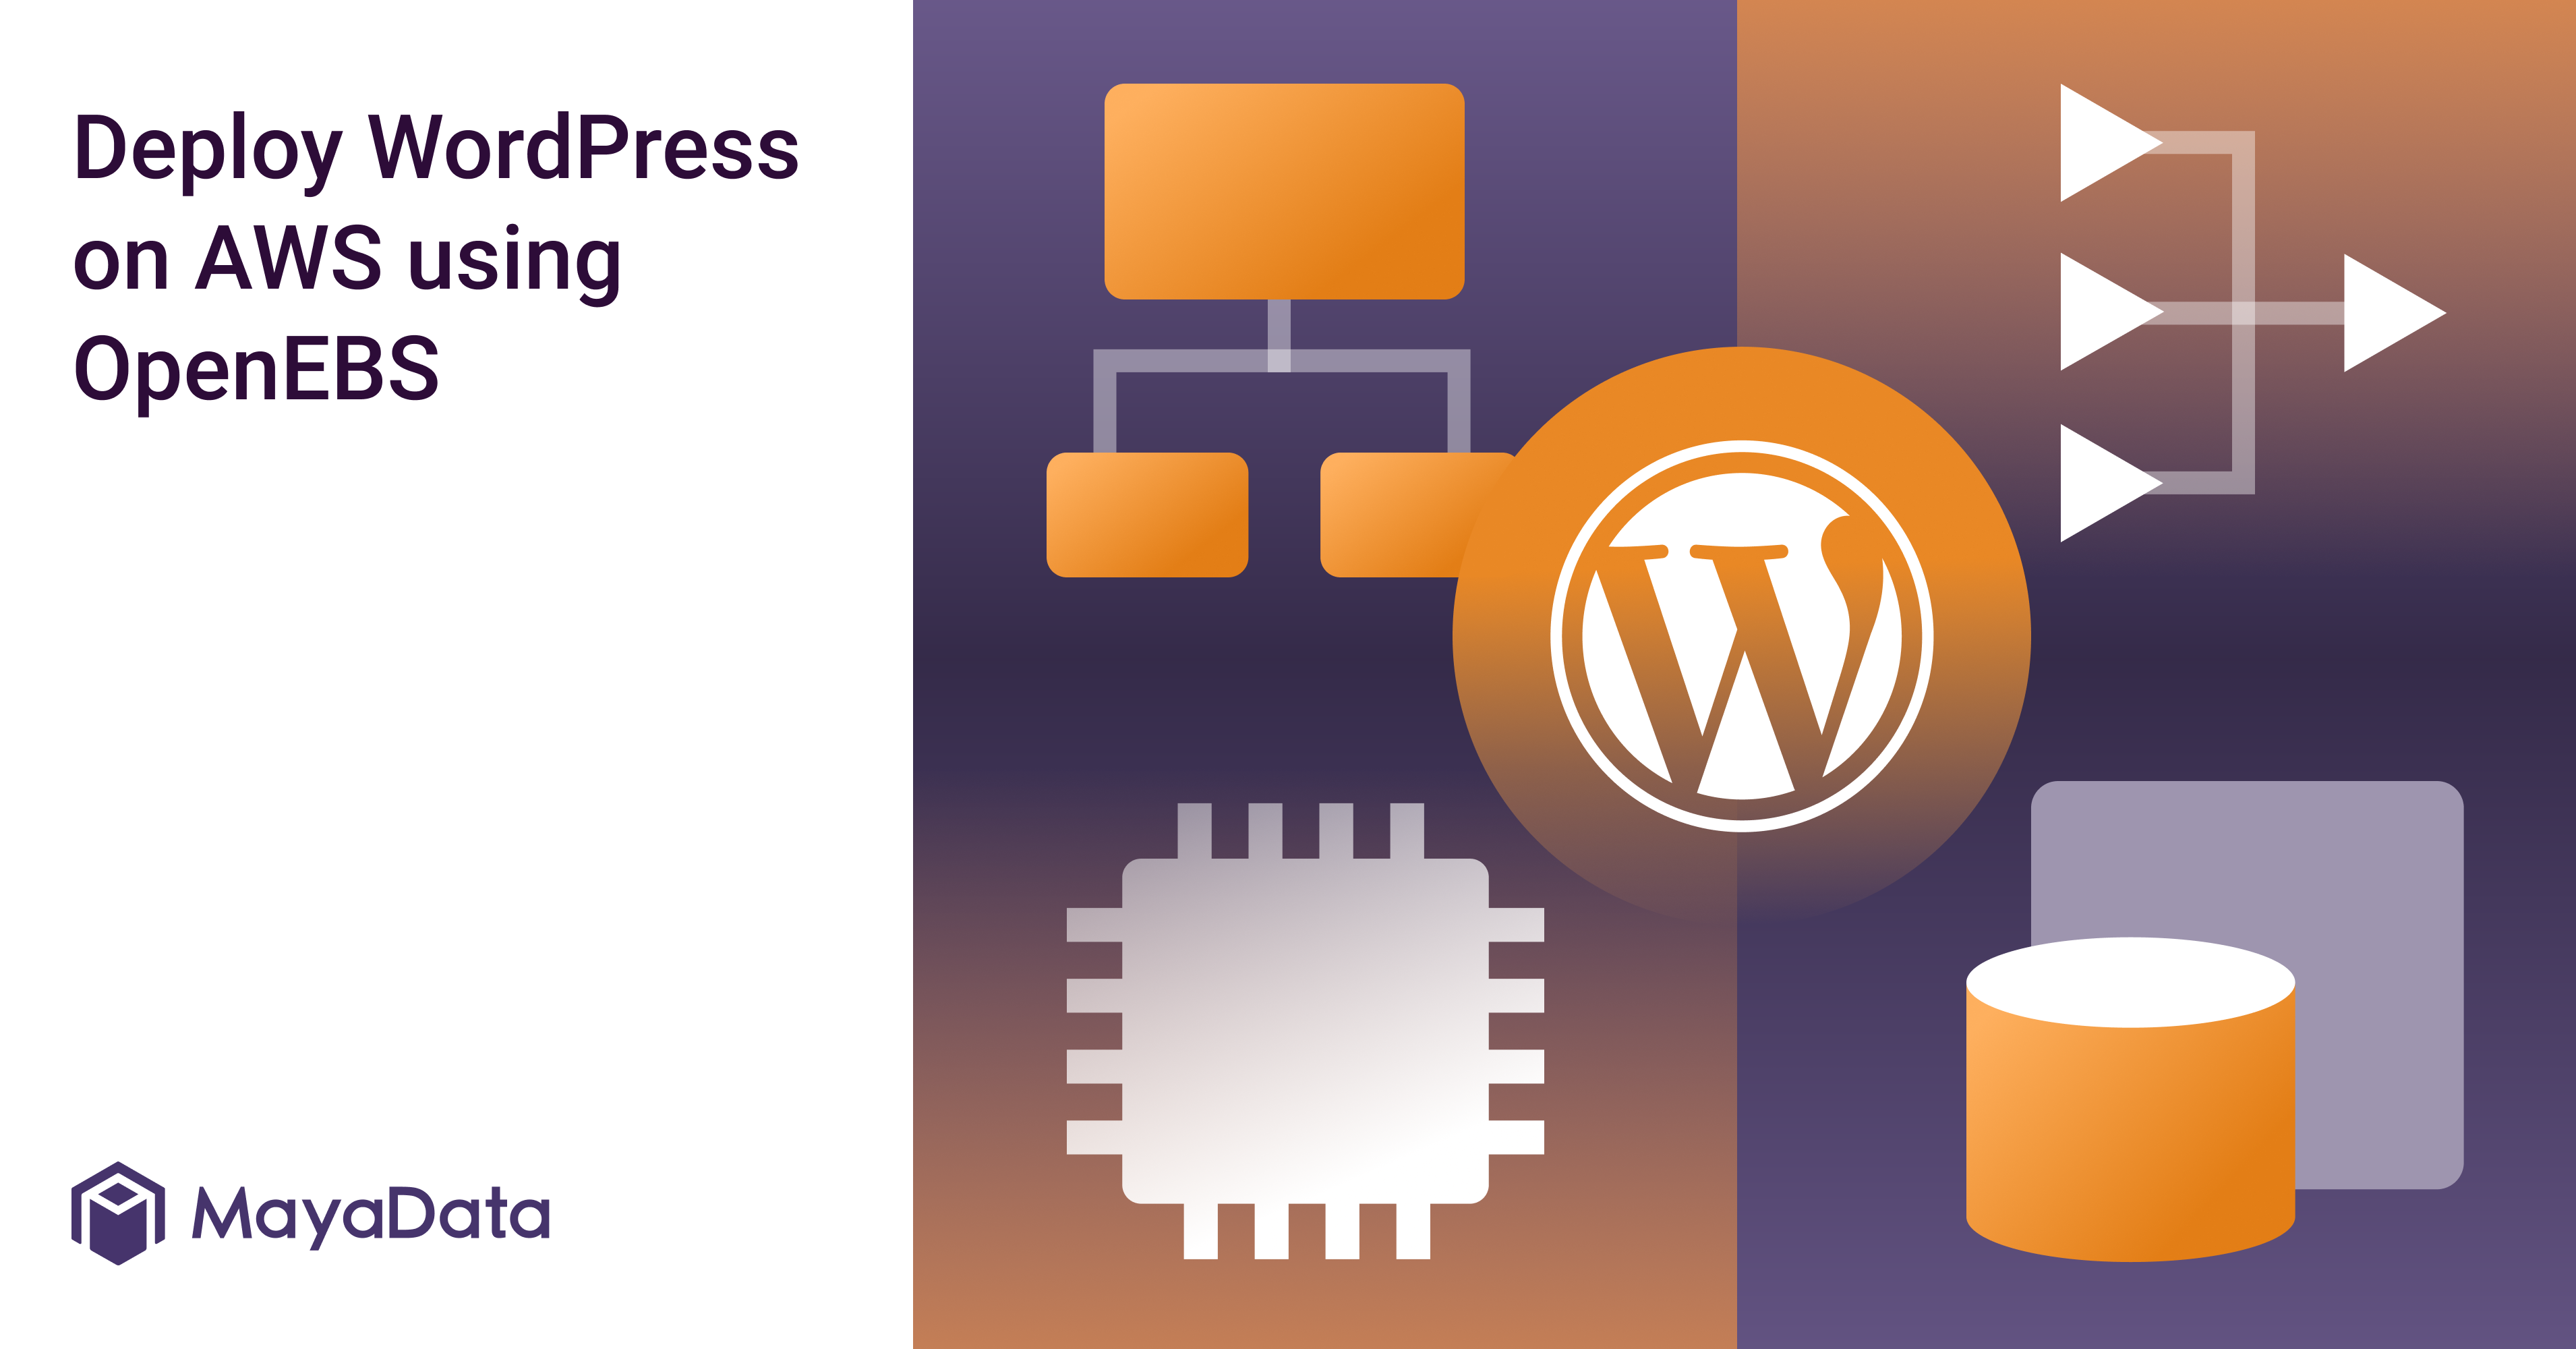 Deploy WordPress on AWS using OpenEBS